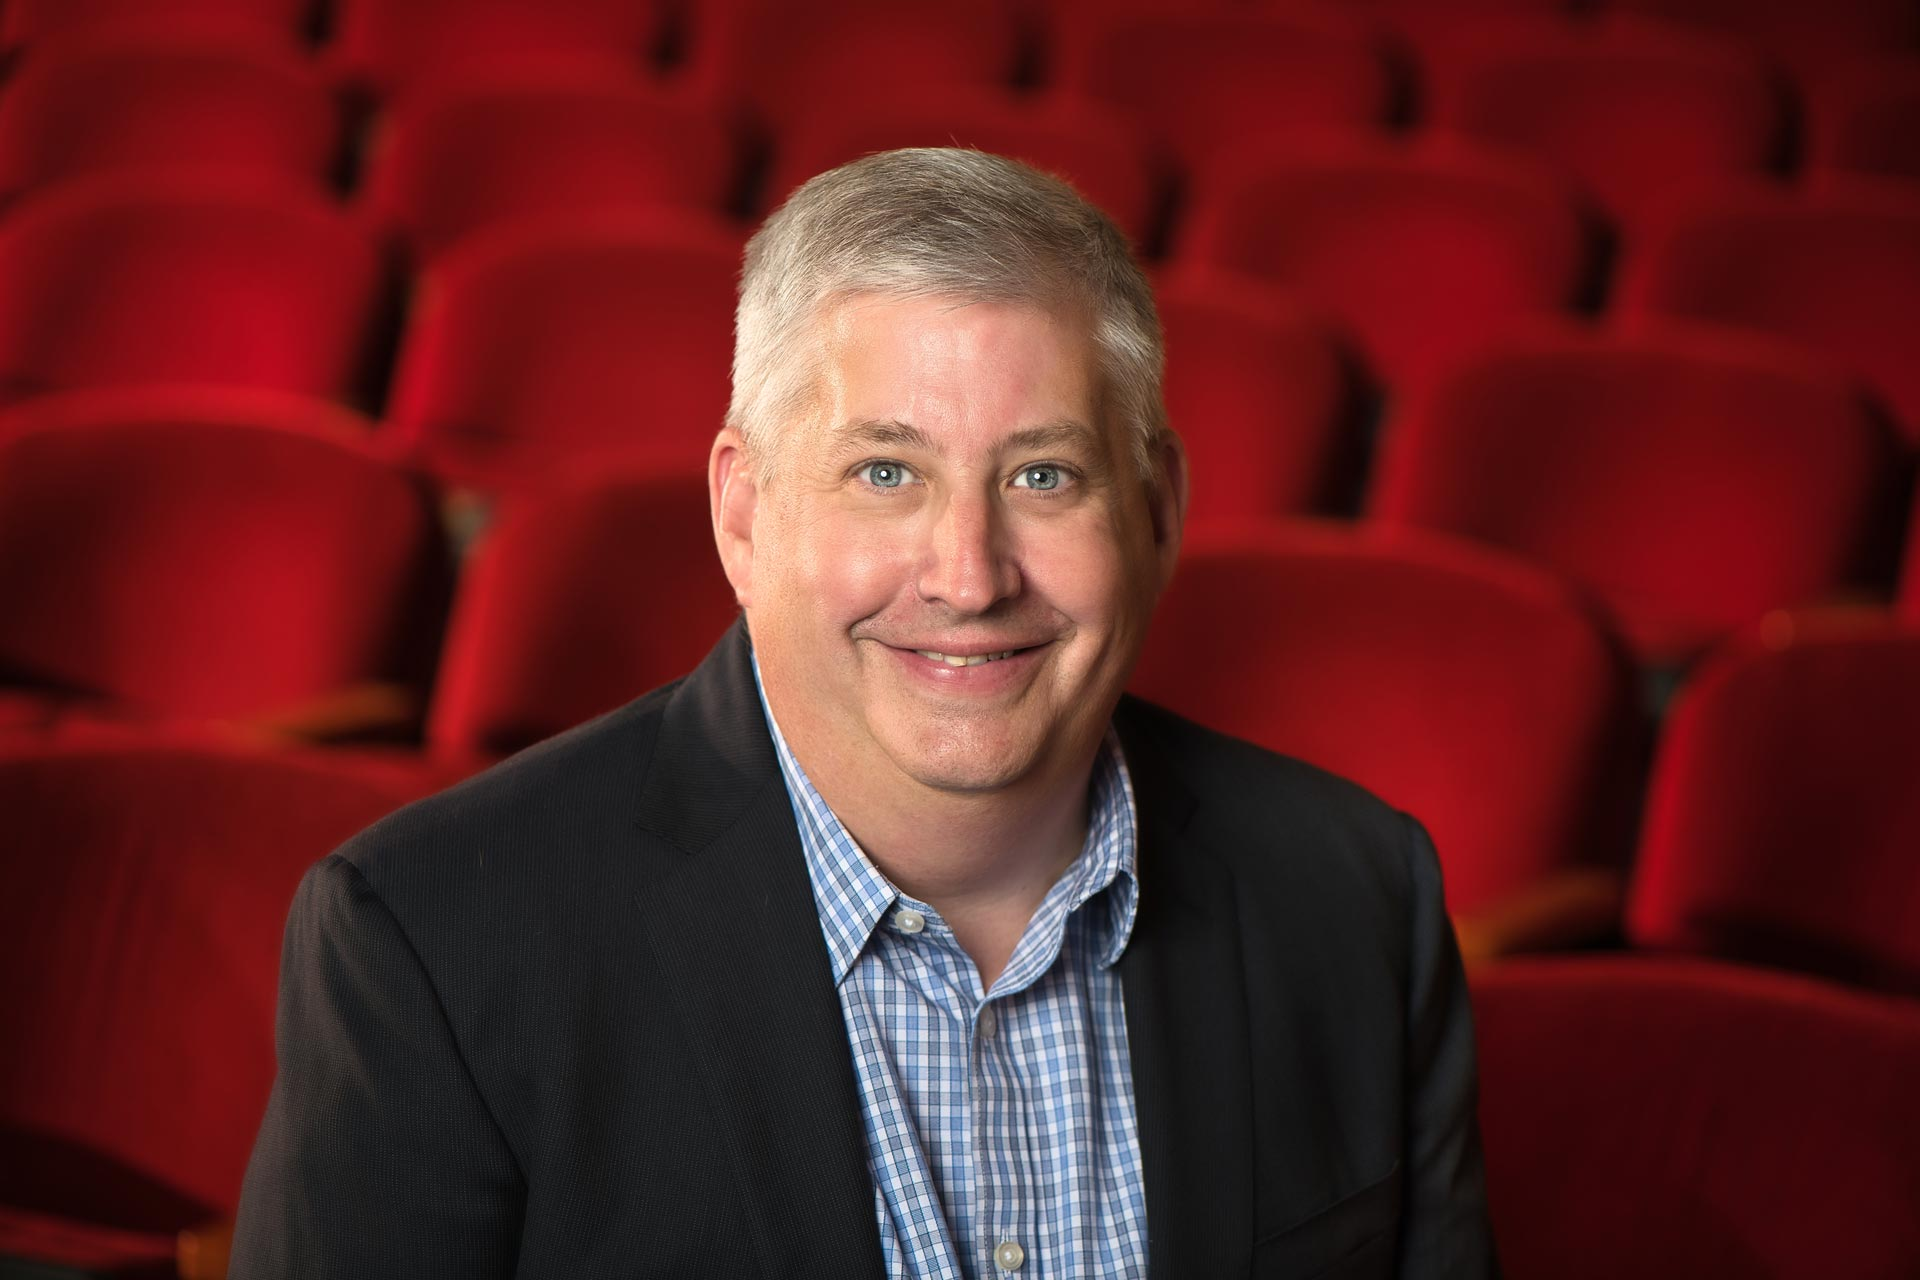 David C. Neal